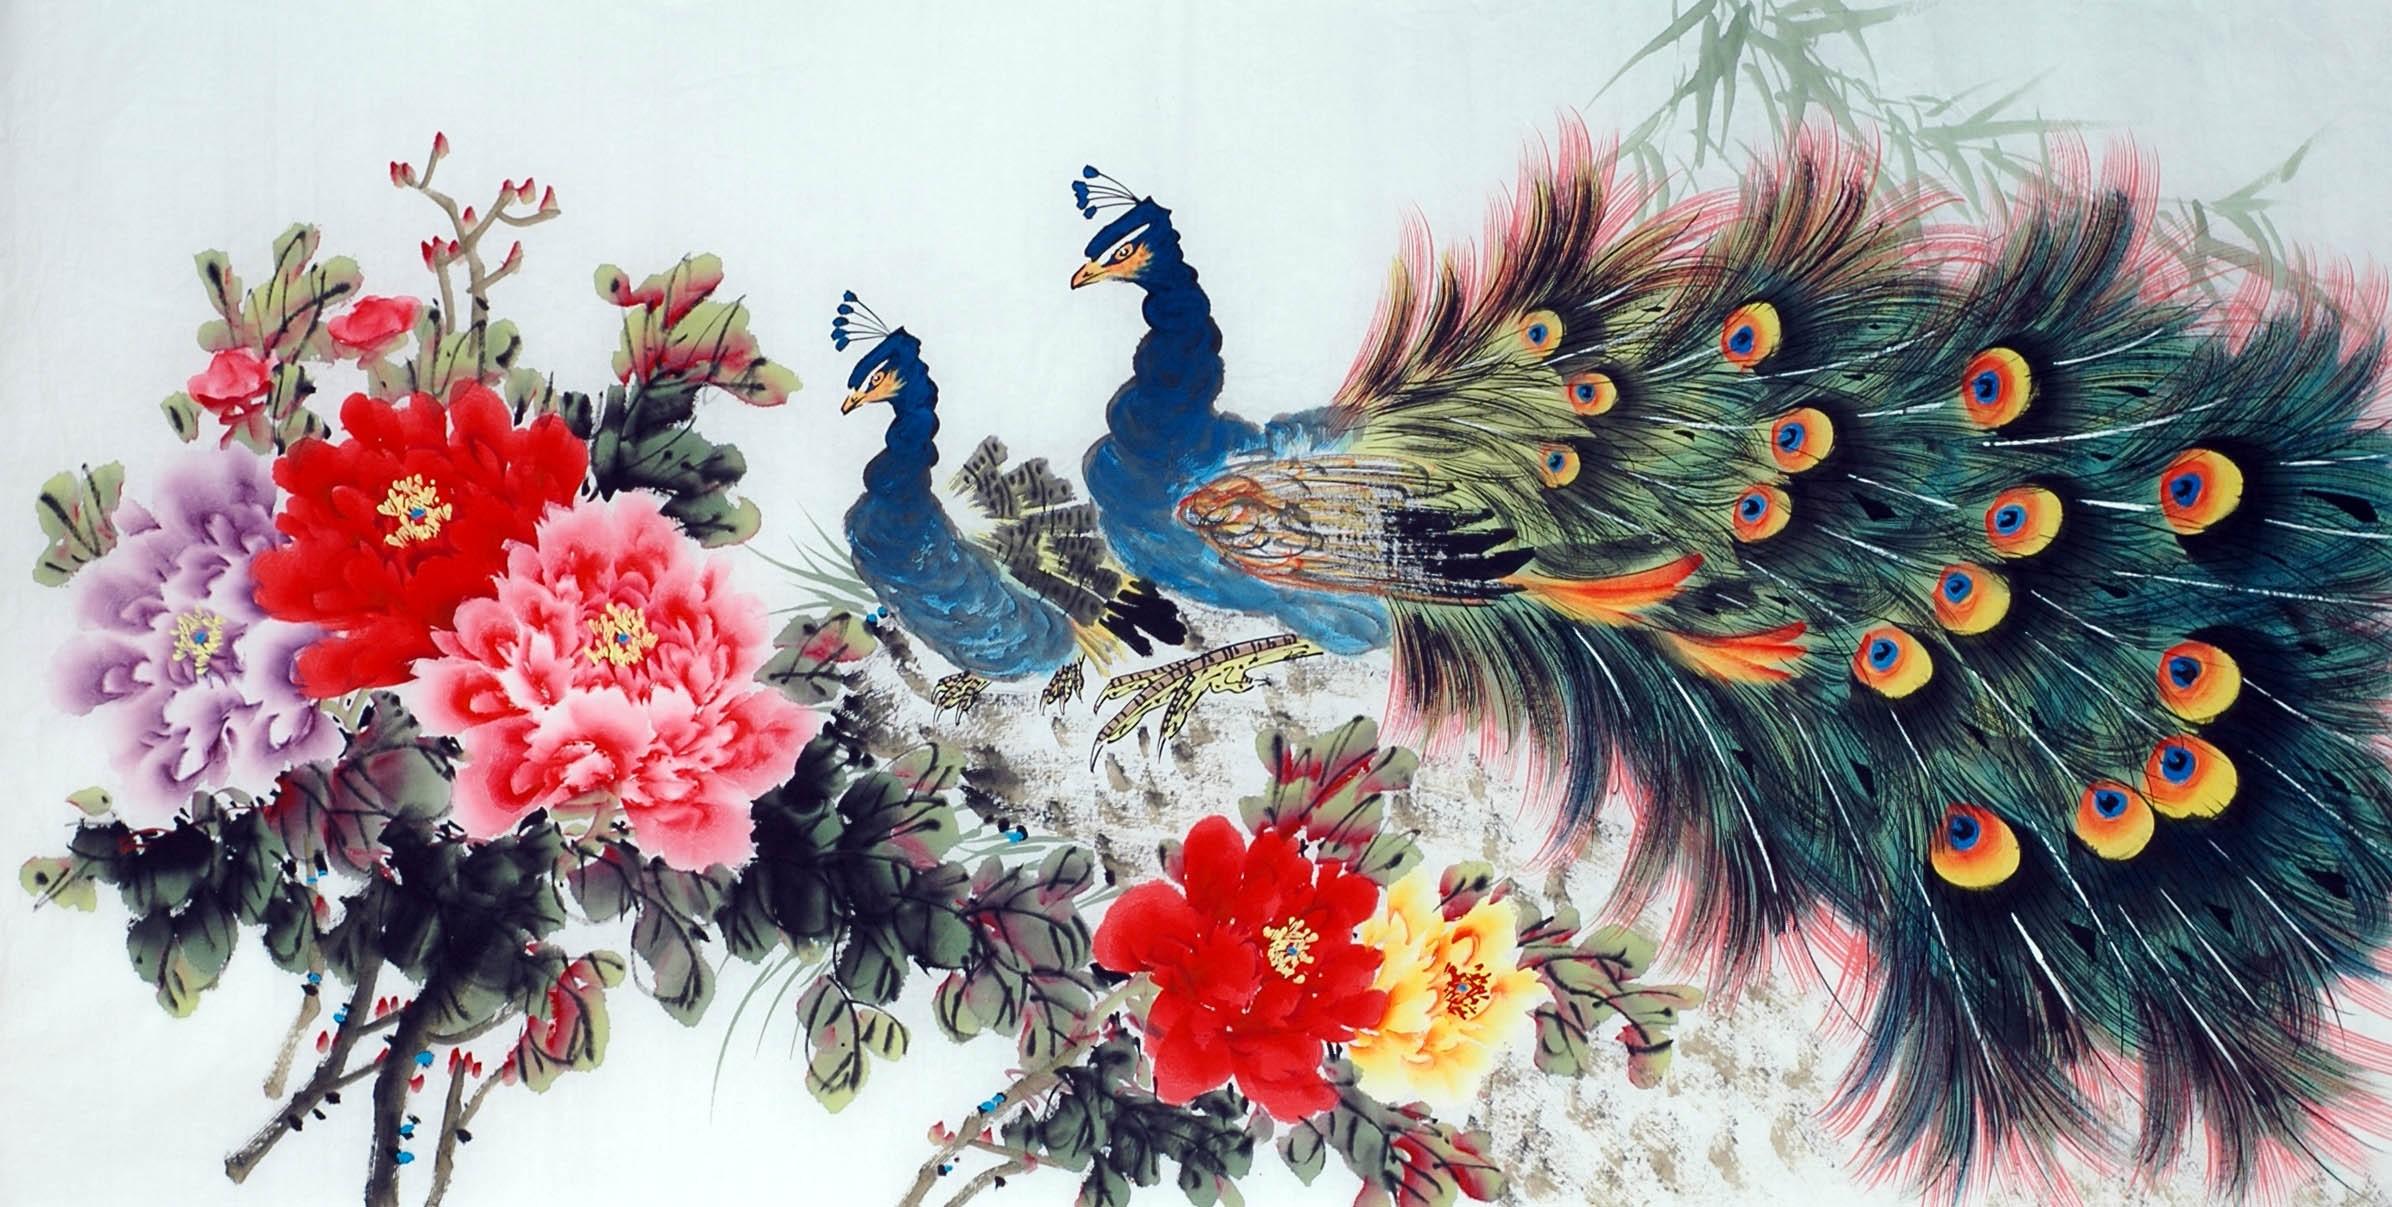 Chinese Peacock Painting - CNAG013354 - CNArtGallery.com